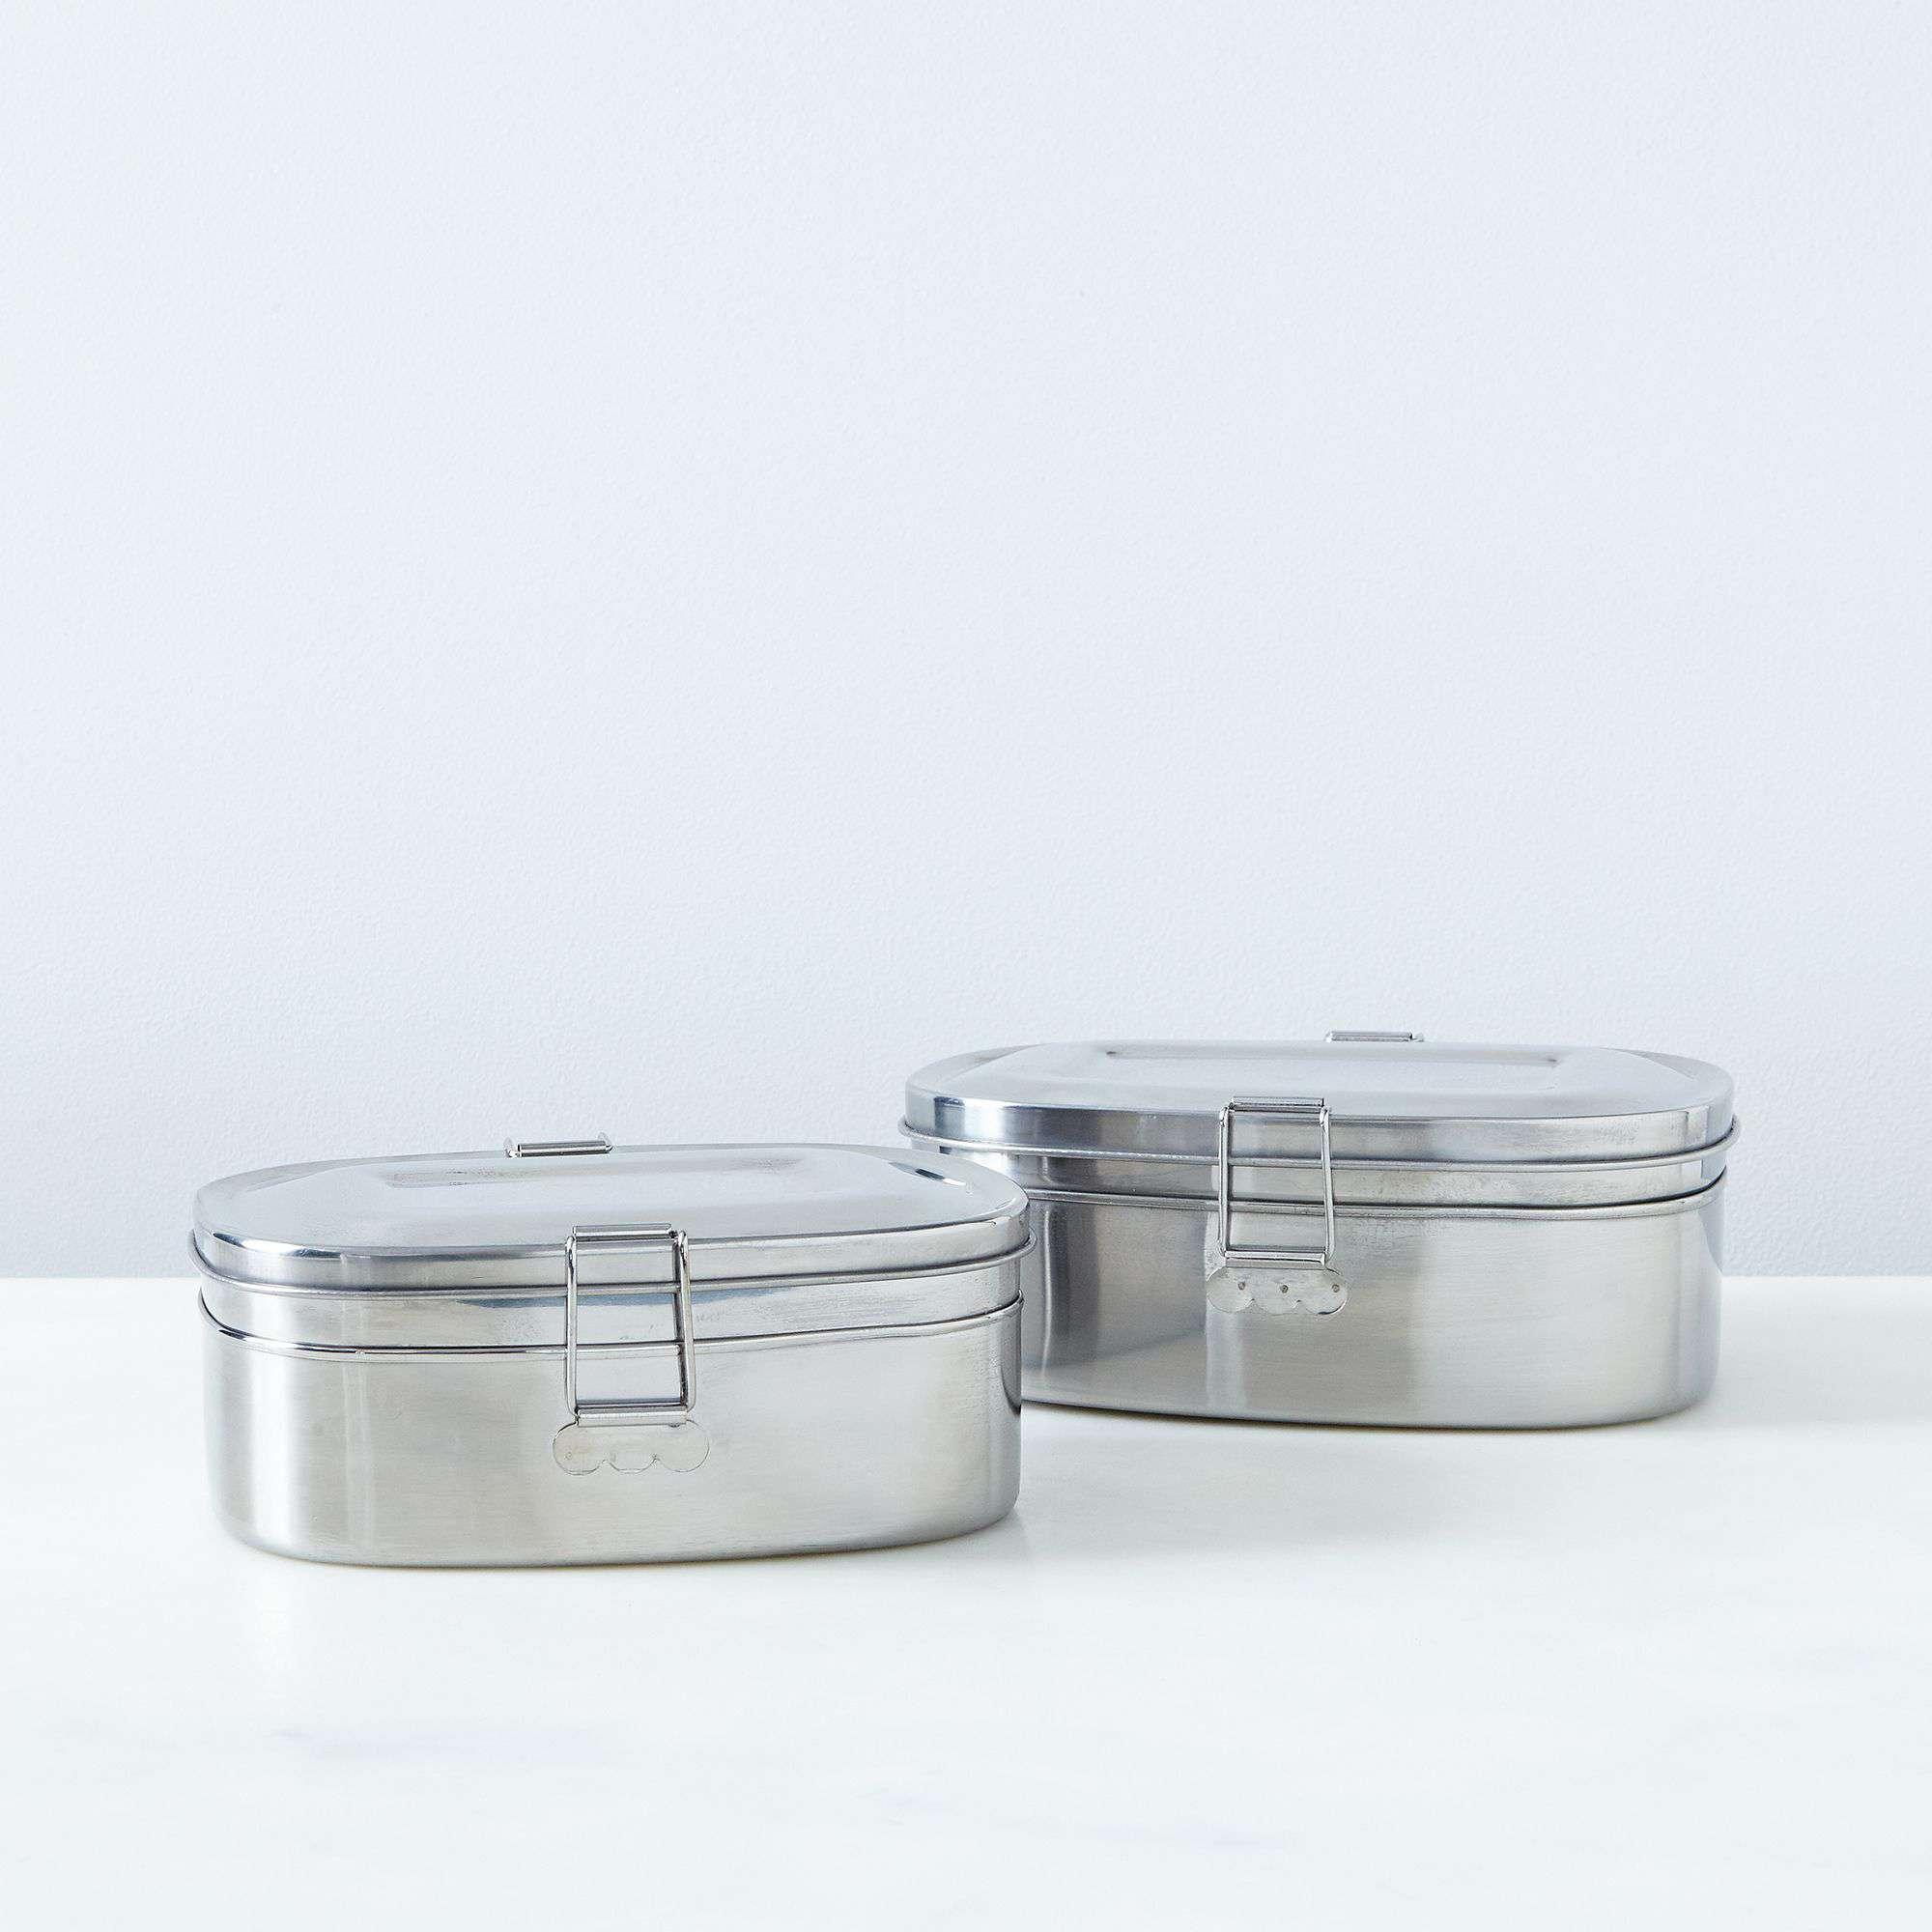 onyx-2-layer-sandwich-box